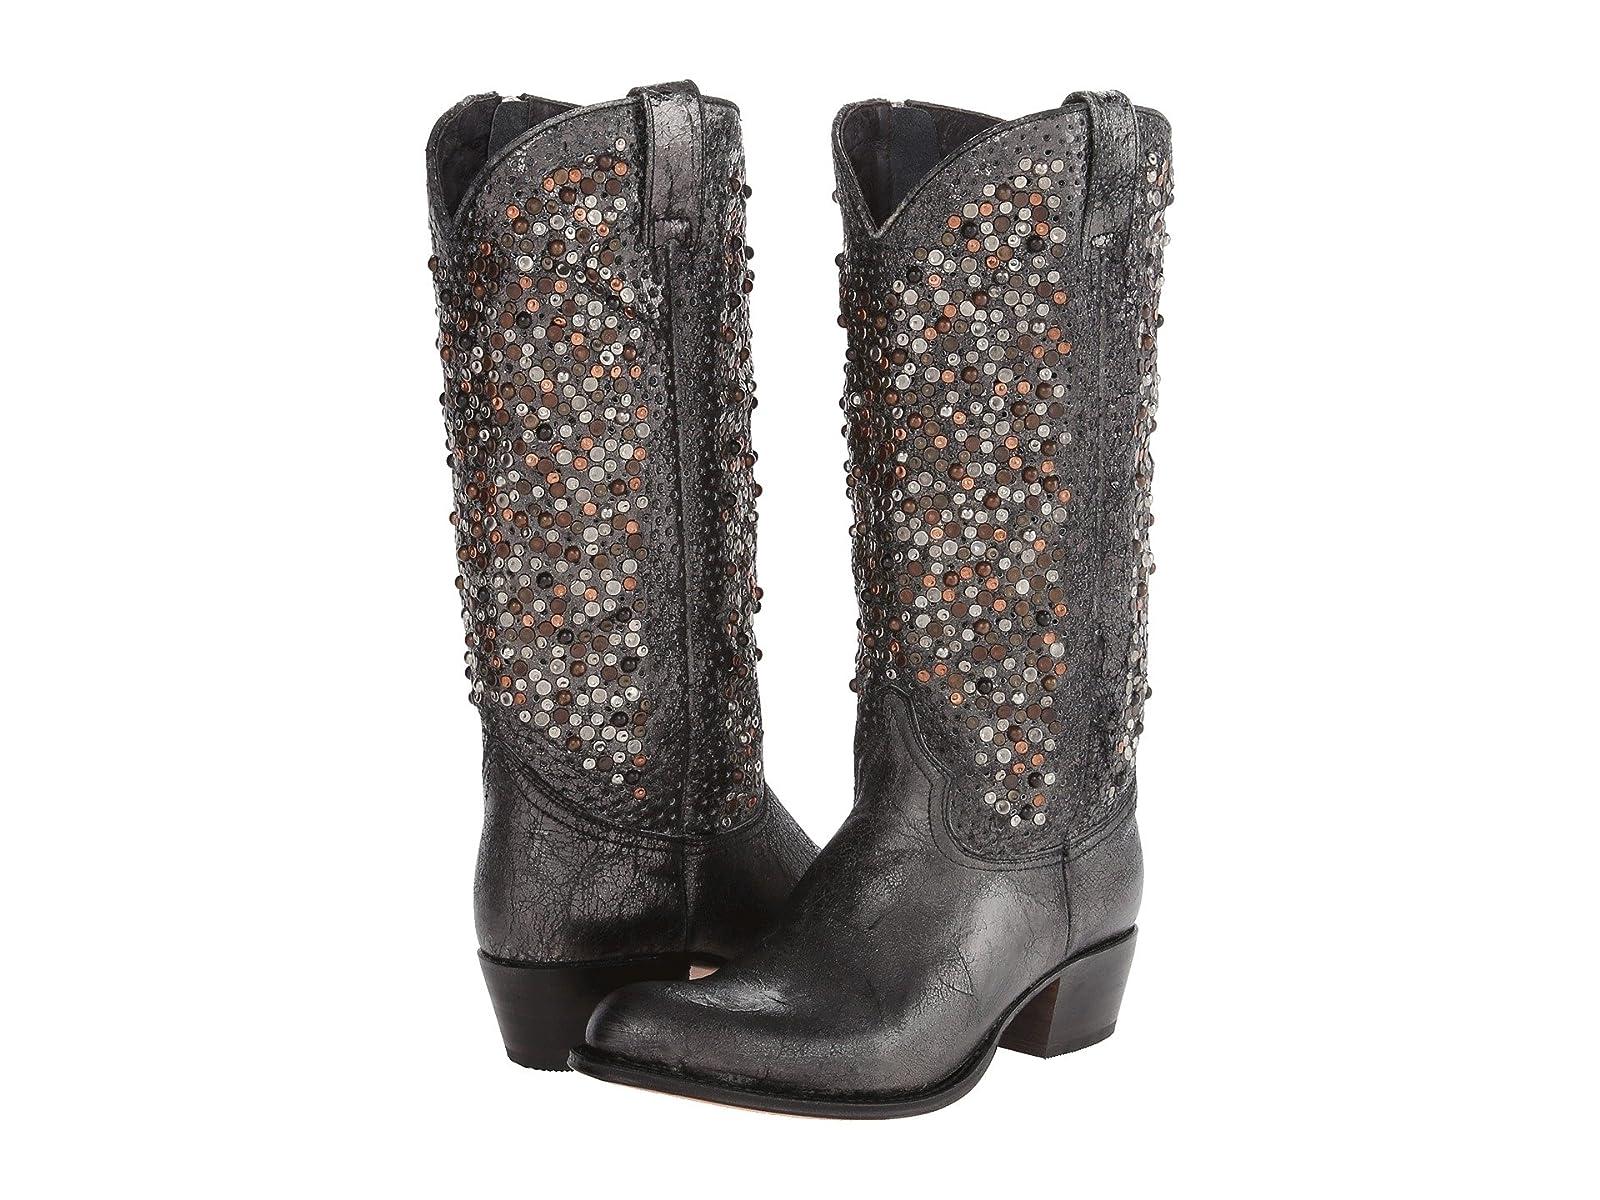 Frye Deborah Studded TallCheap and distinctive eye-catching shoes